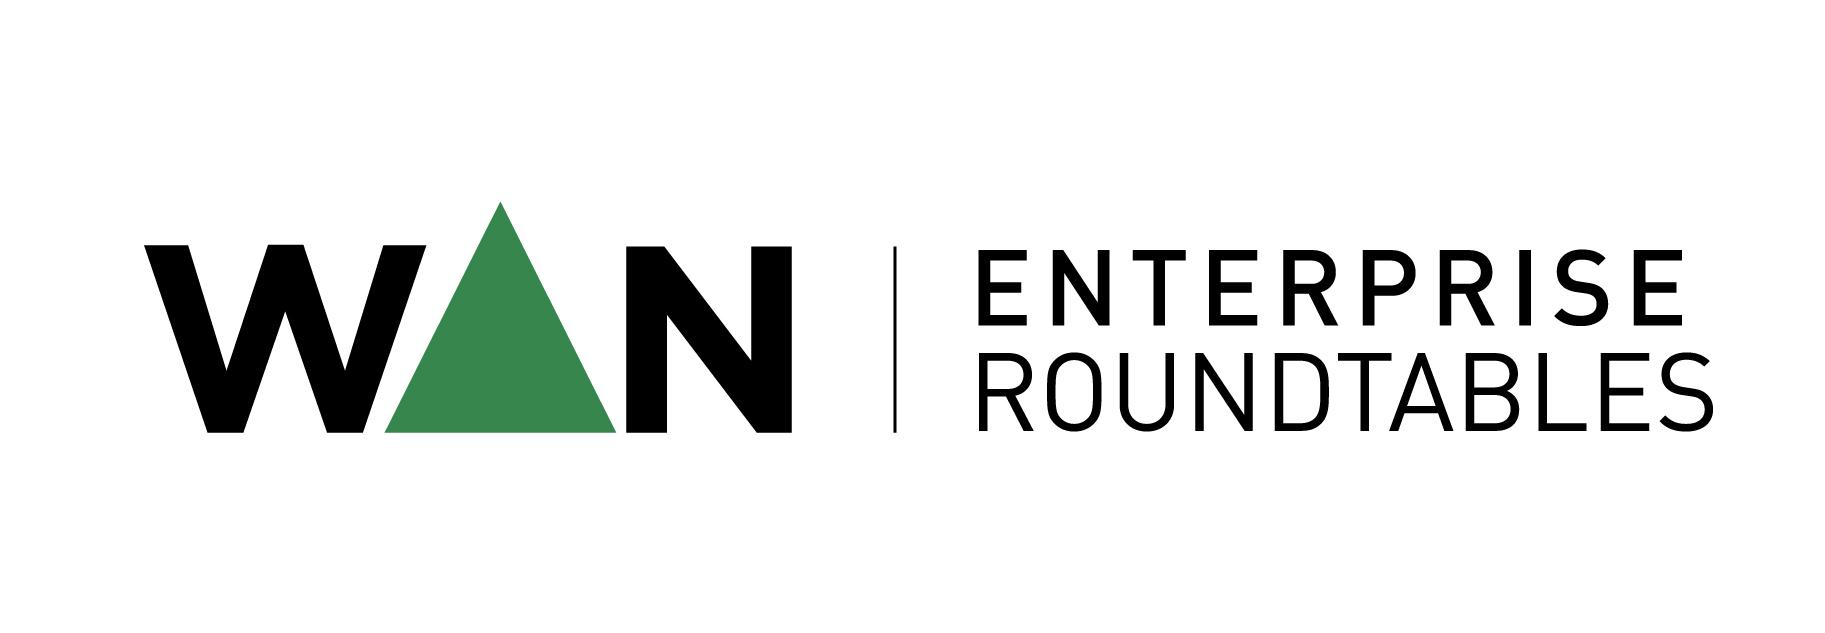 WAN-Enterprise-ROUNDTABLES-singapore.jpg